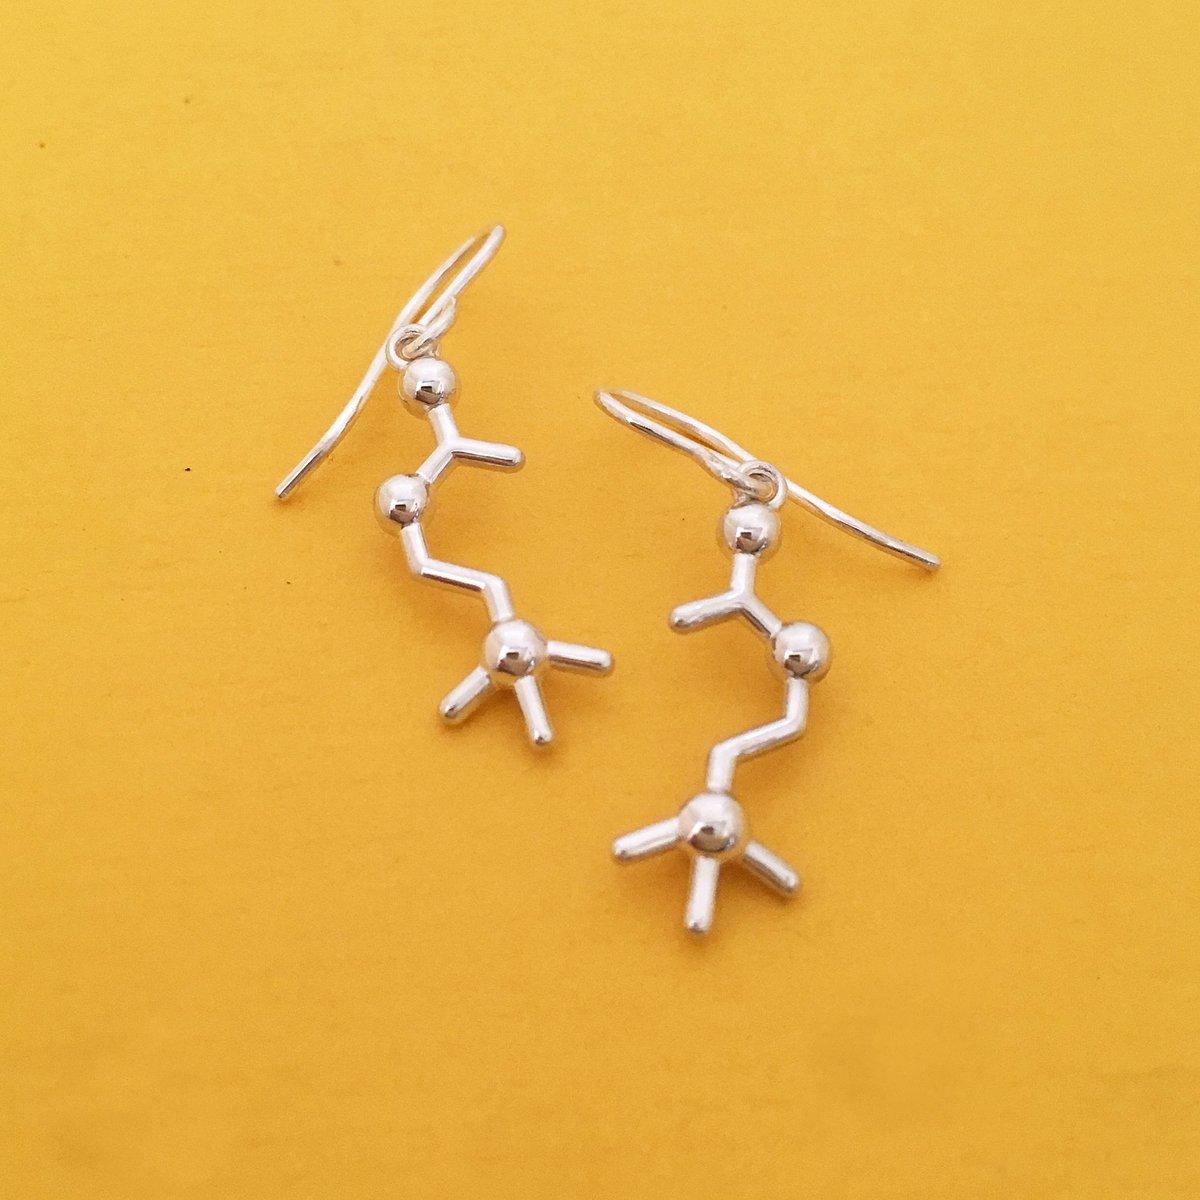 Image of acetylcholine earrings